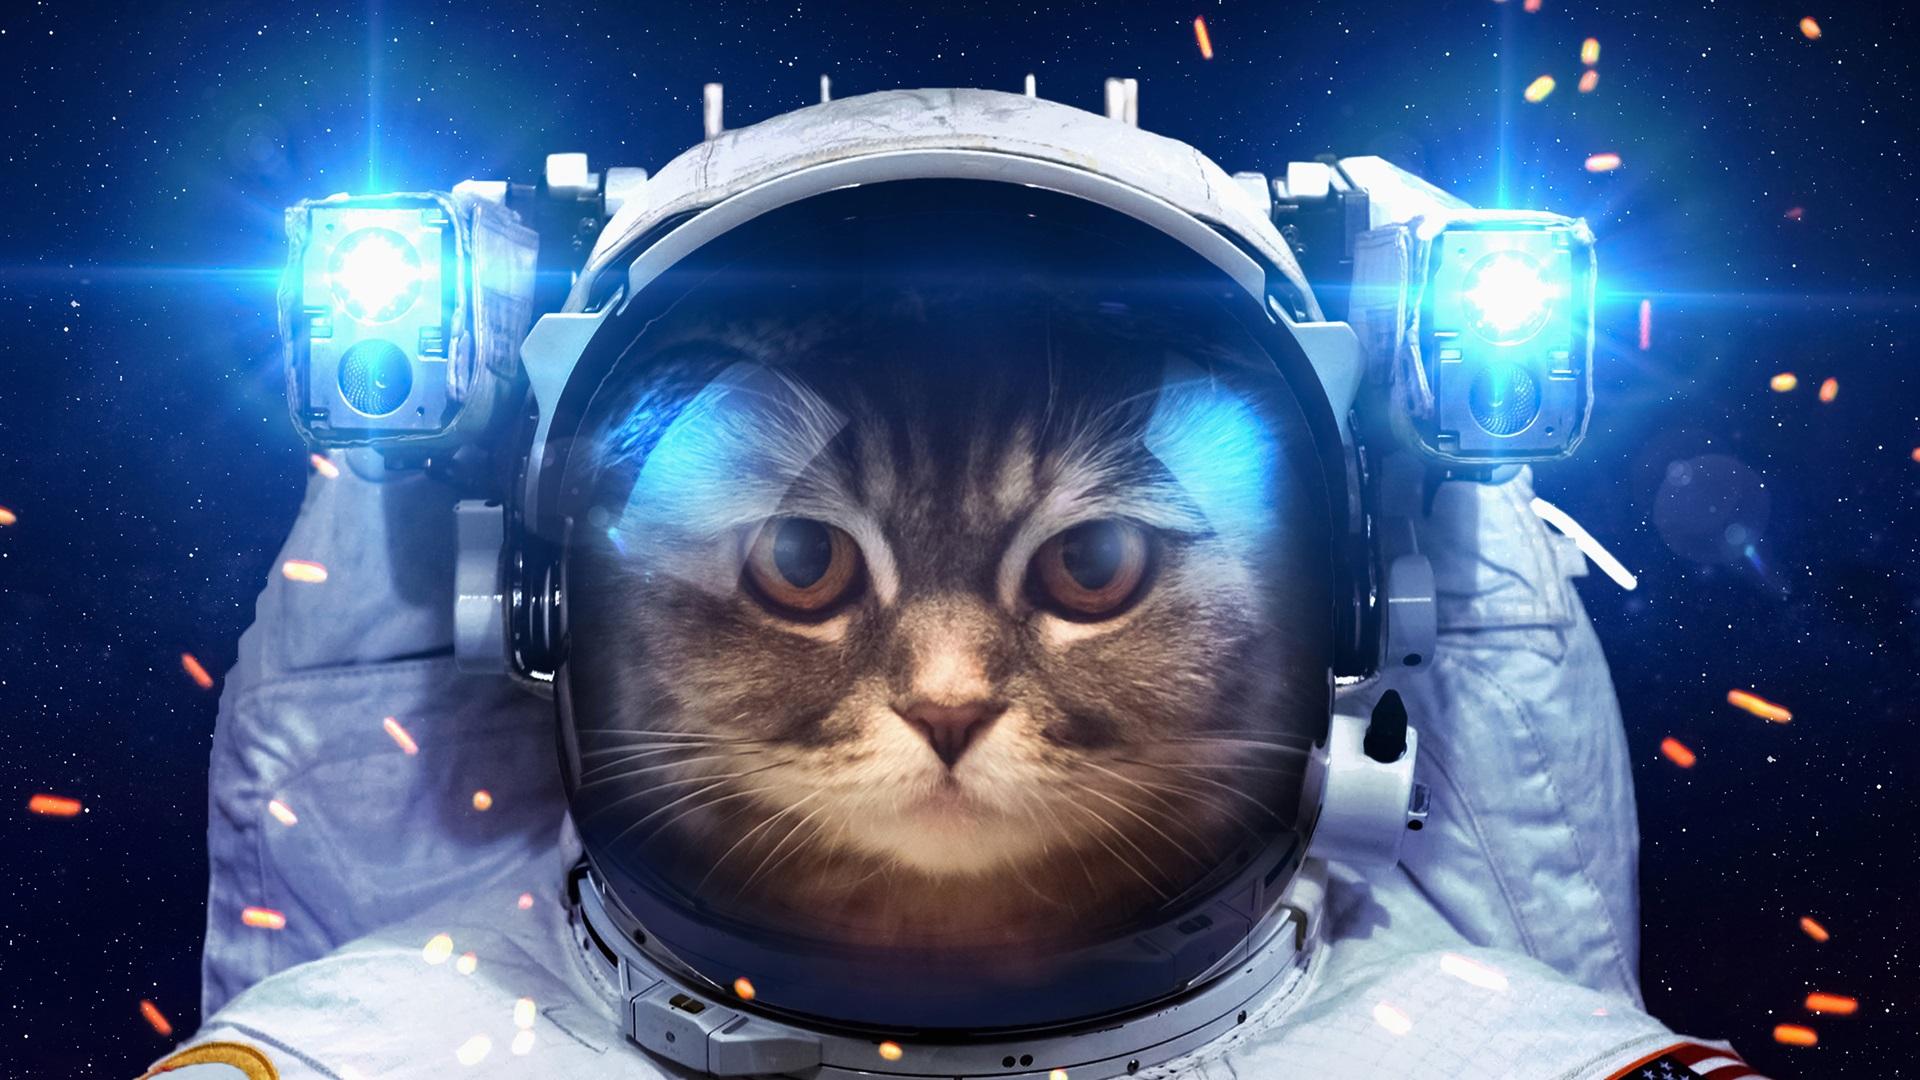 Humor, cat as a astronaut, space, light Wallpaper ...